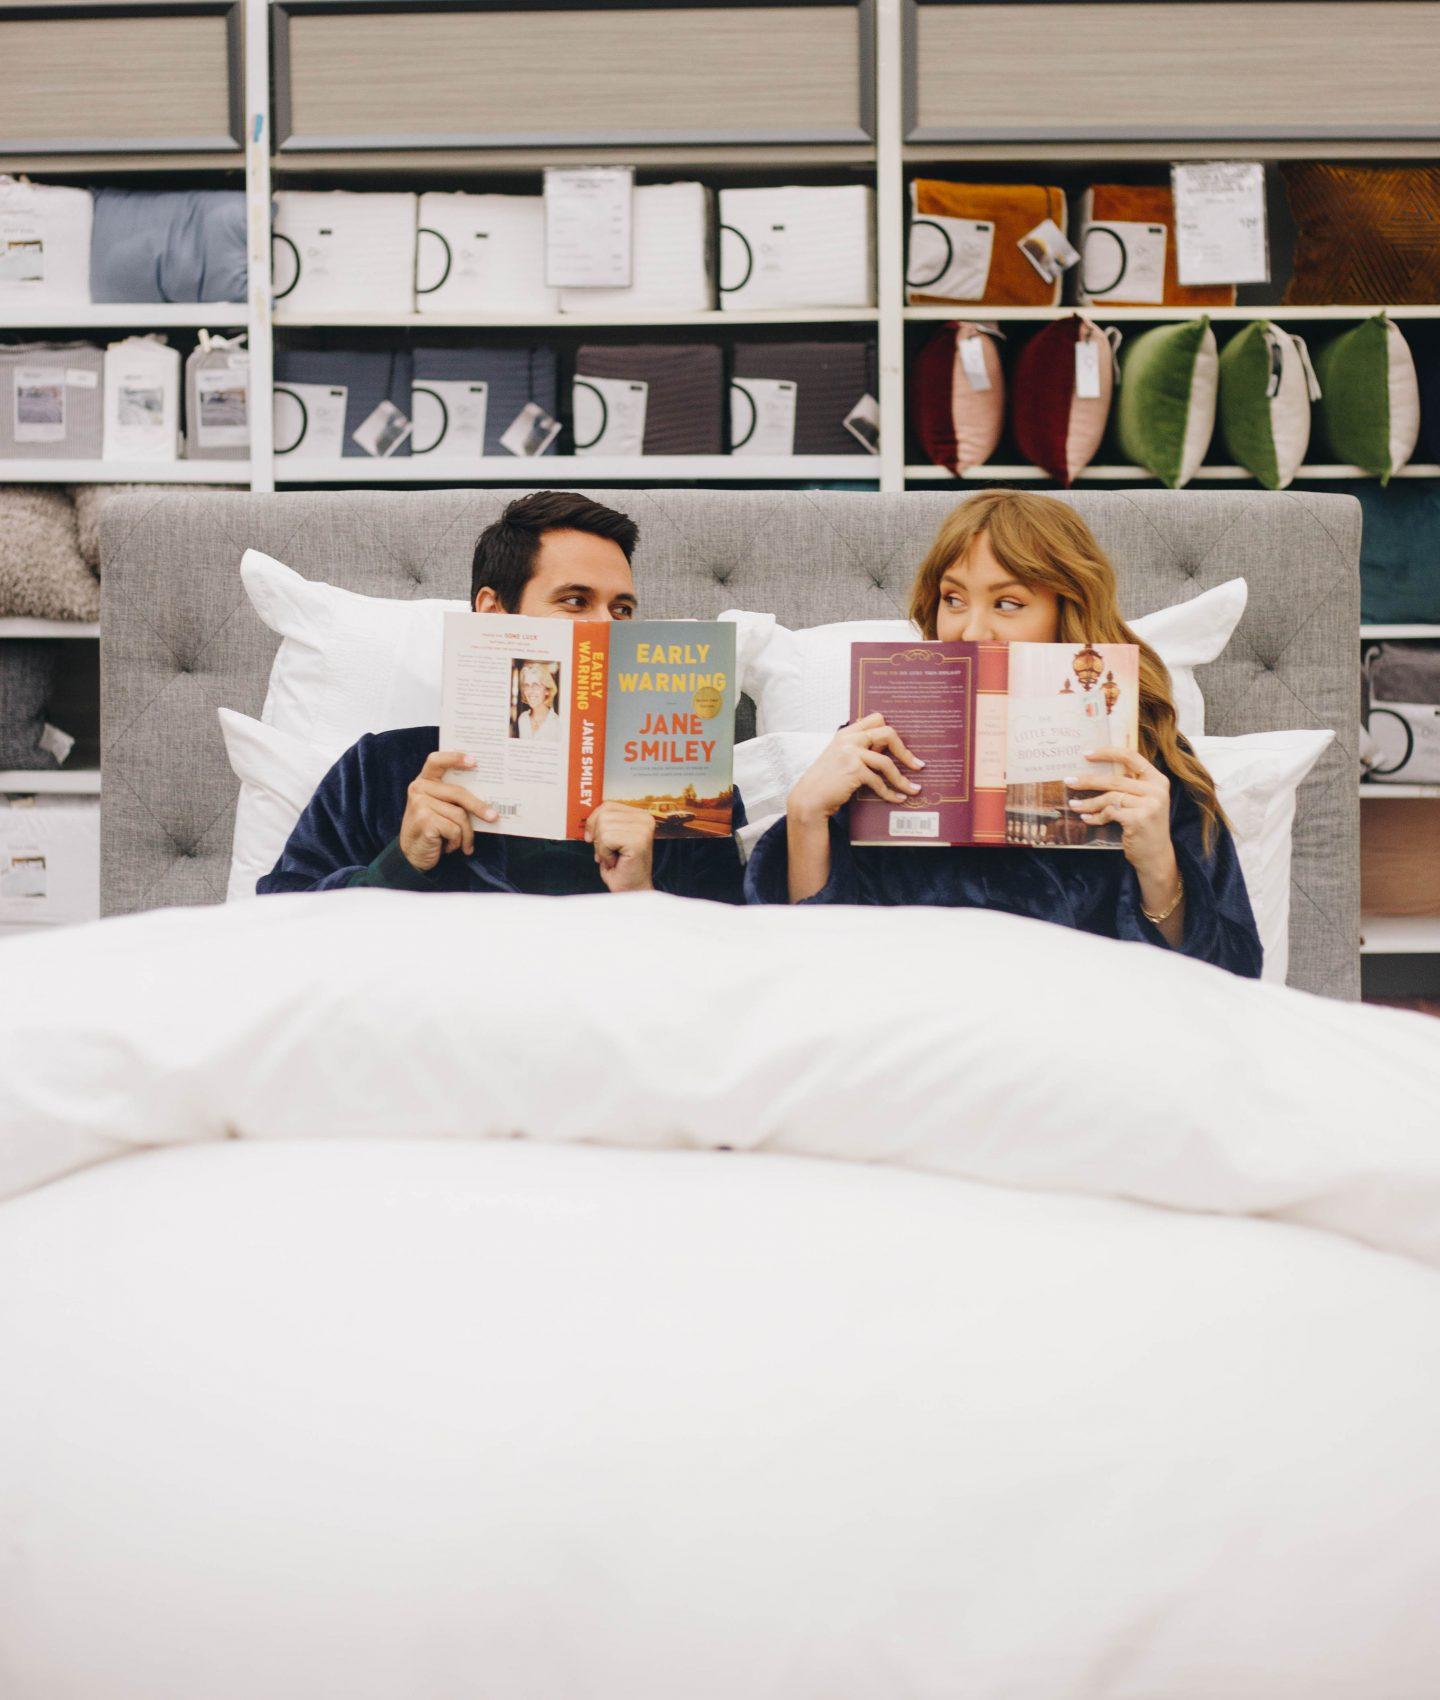 bed bath and beyond, registry, wedding registry, wedding registry picks, what to register for, how to register